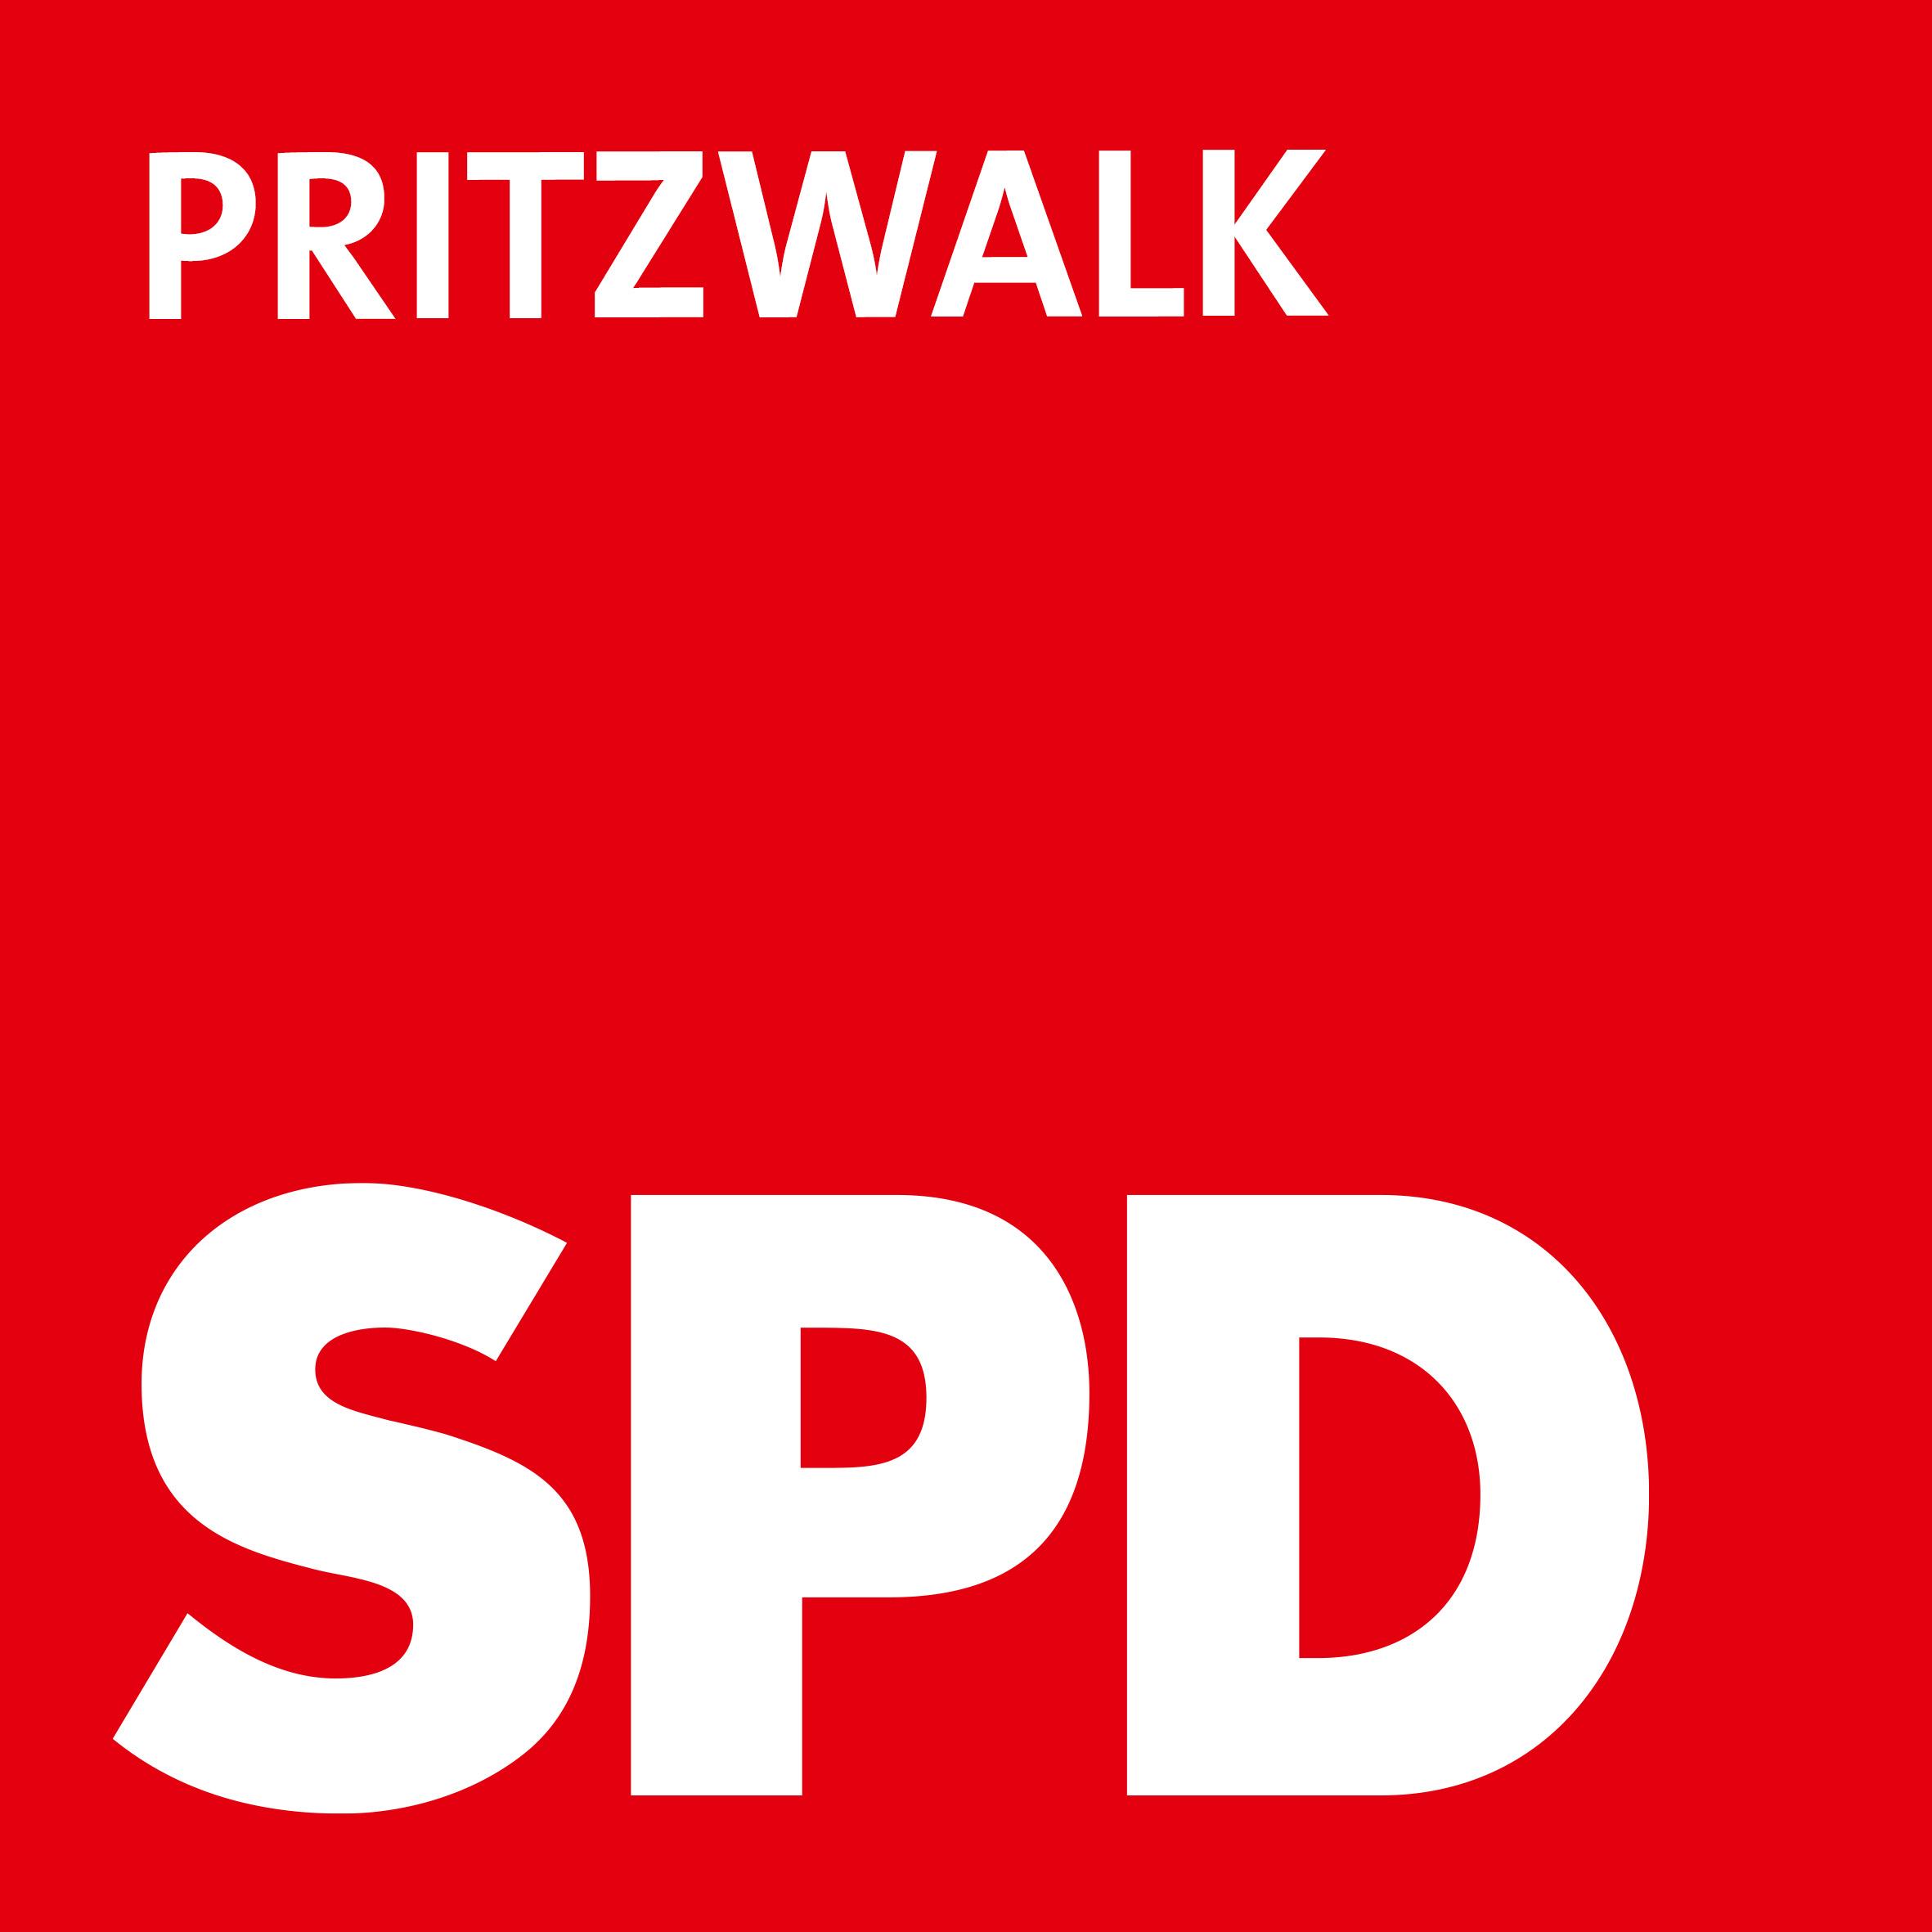 SPD Pritzwalk